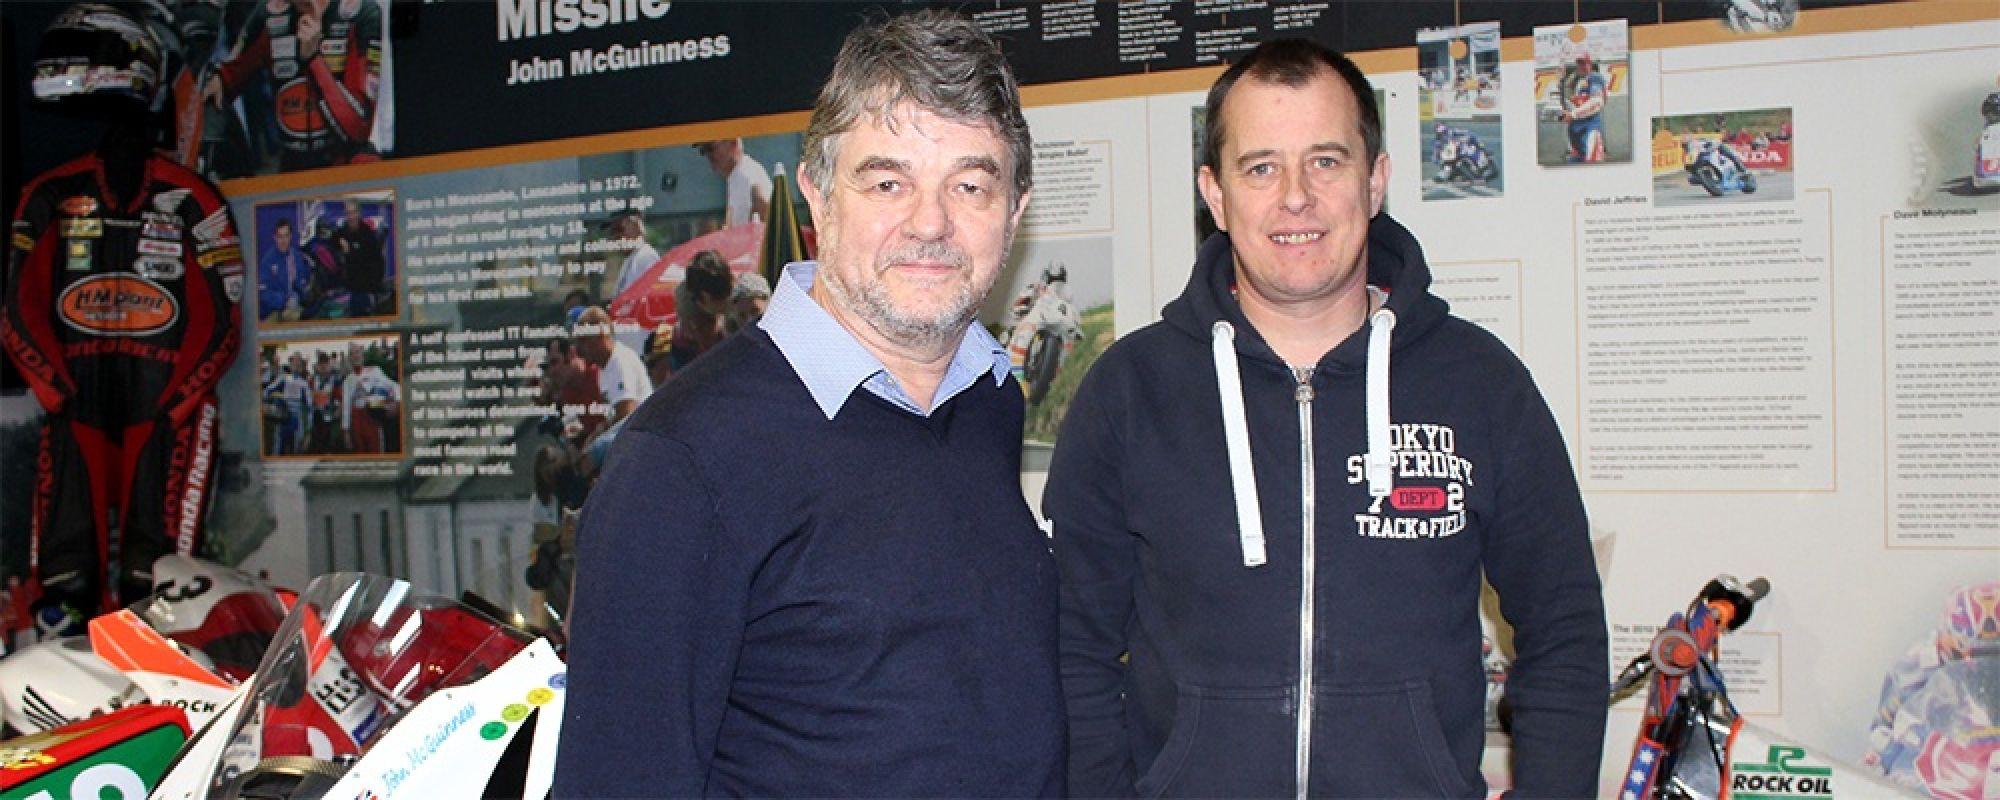 Dennis Frost & John McGuinness visit the museum